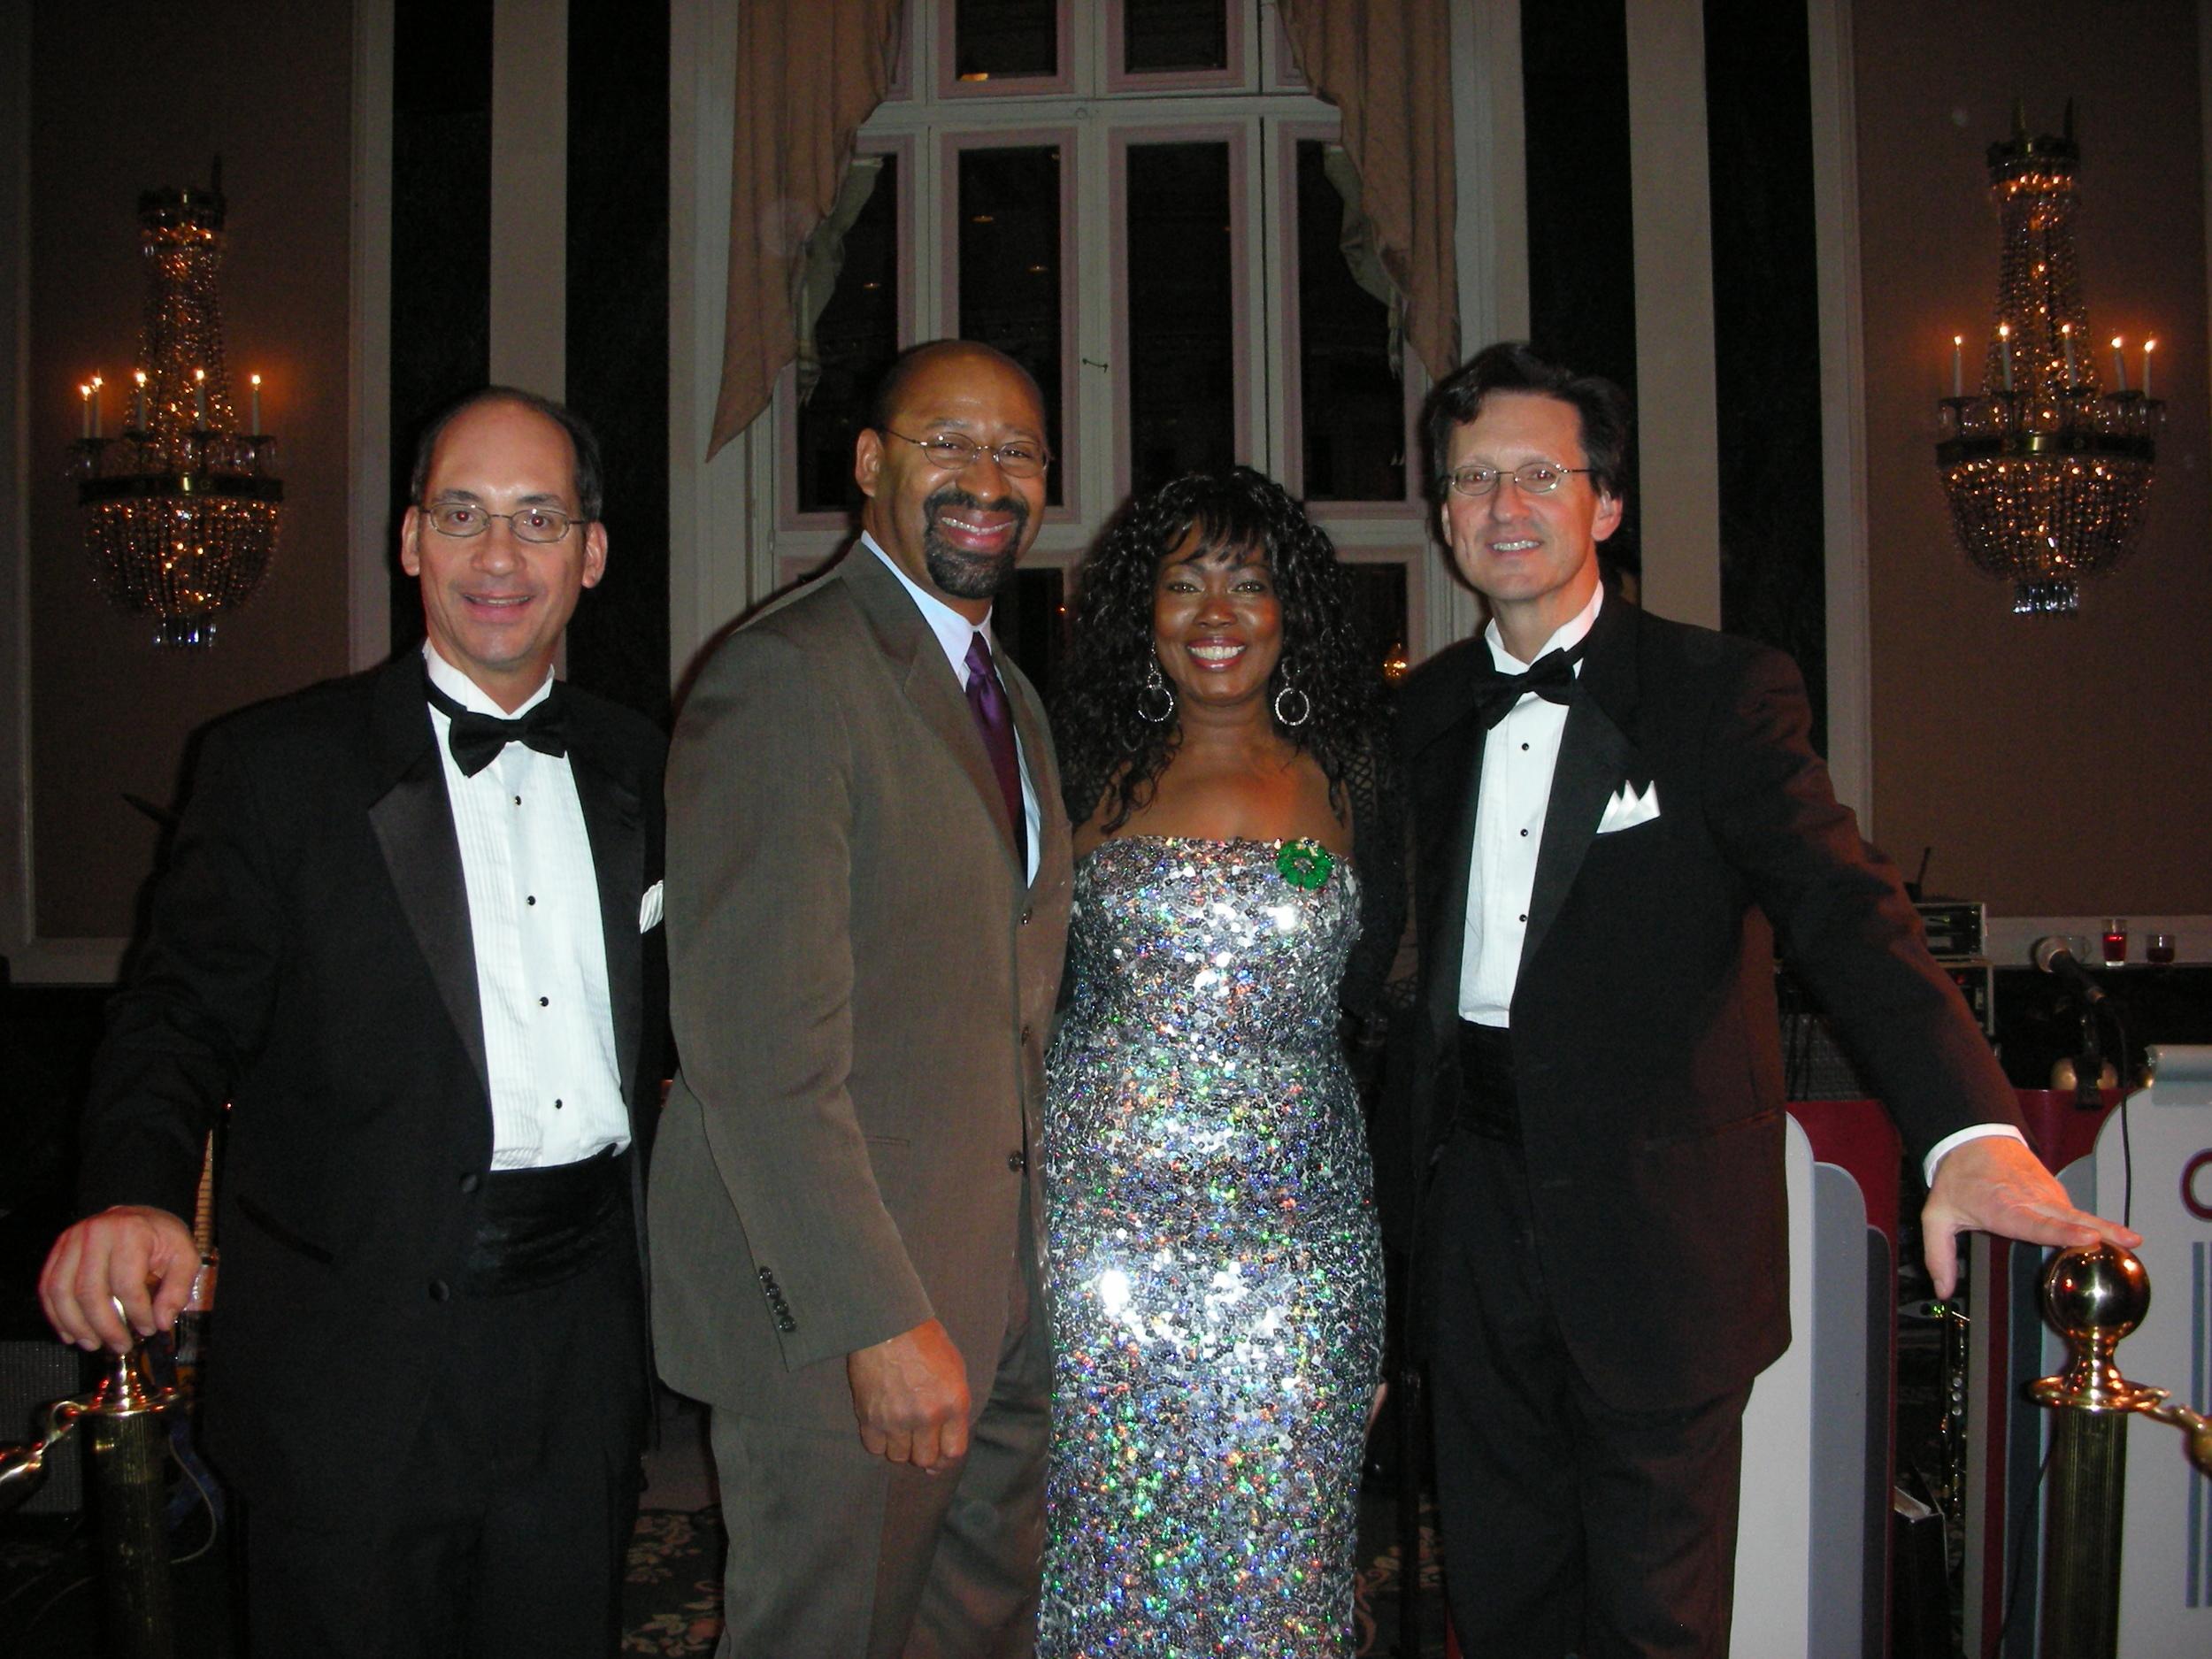 Mayor Nutter, Waldorf Astoria, New York